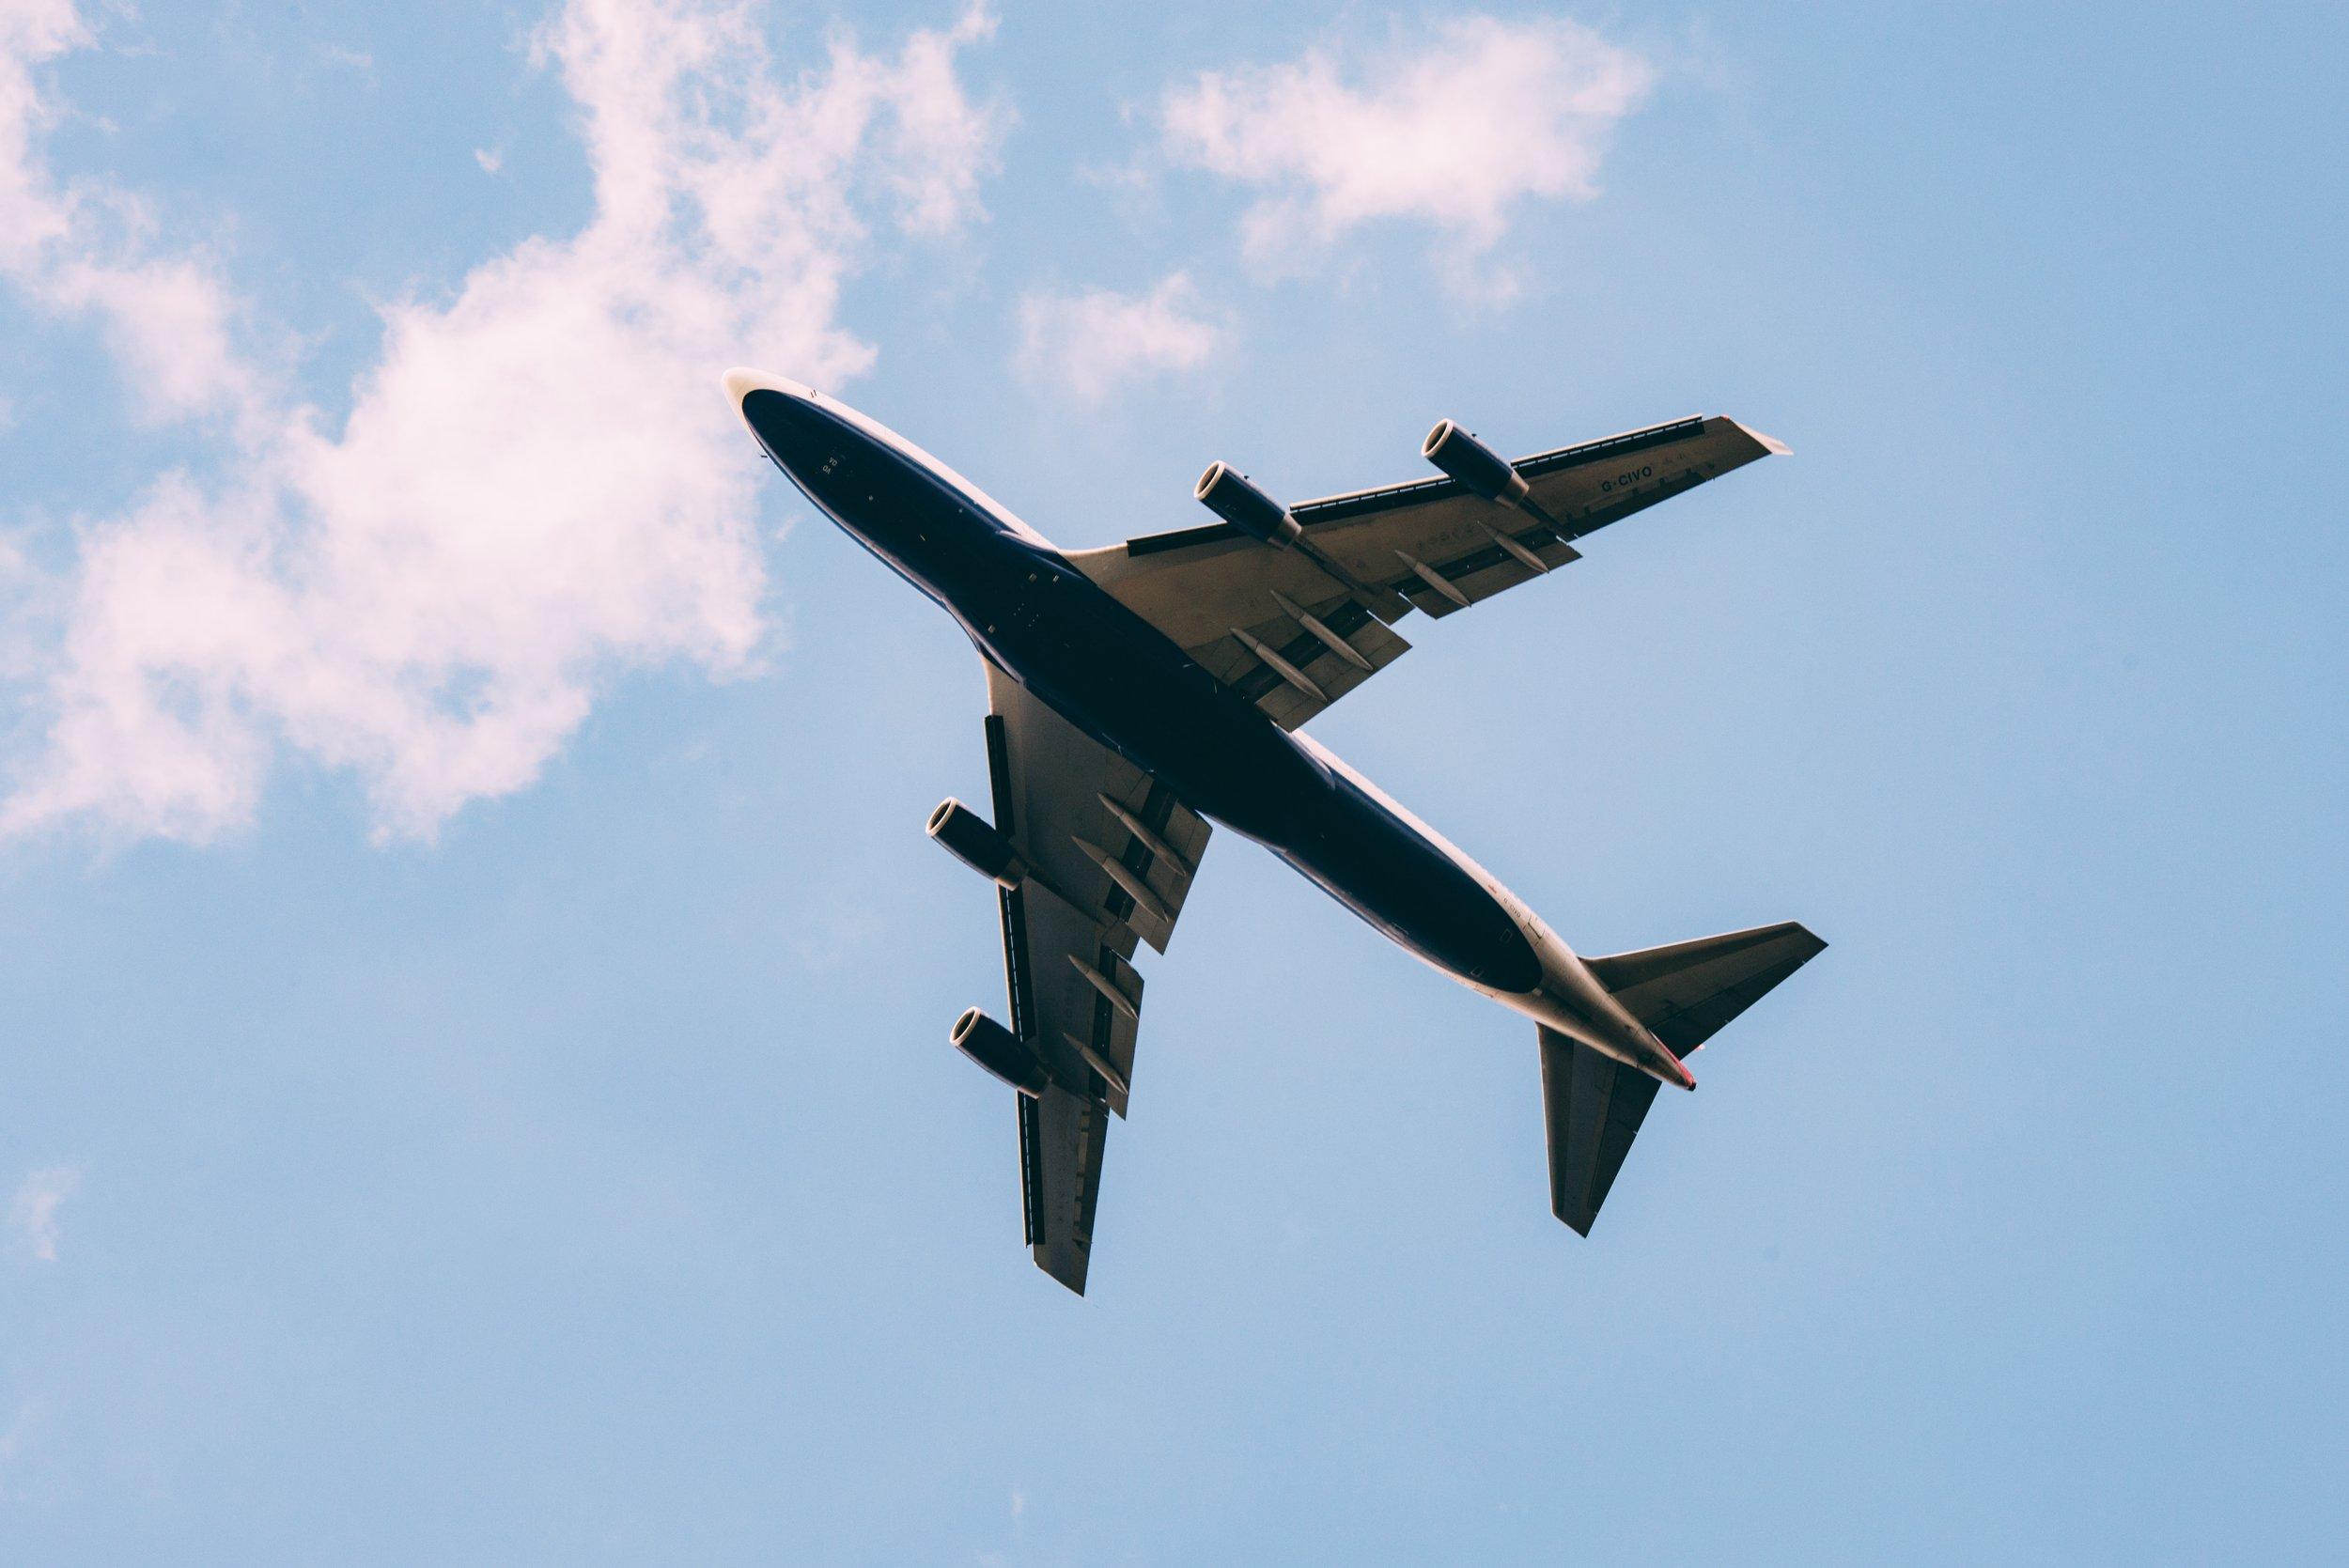 Airplane Photo 3.jpg